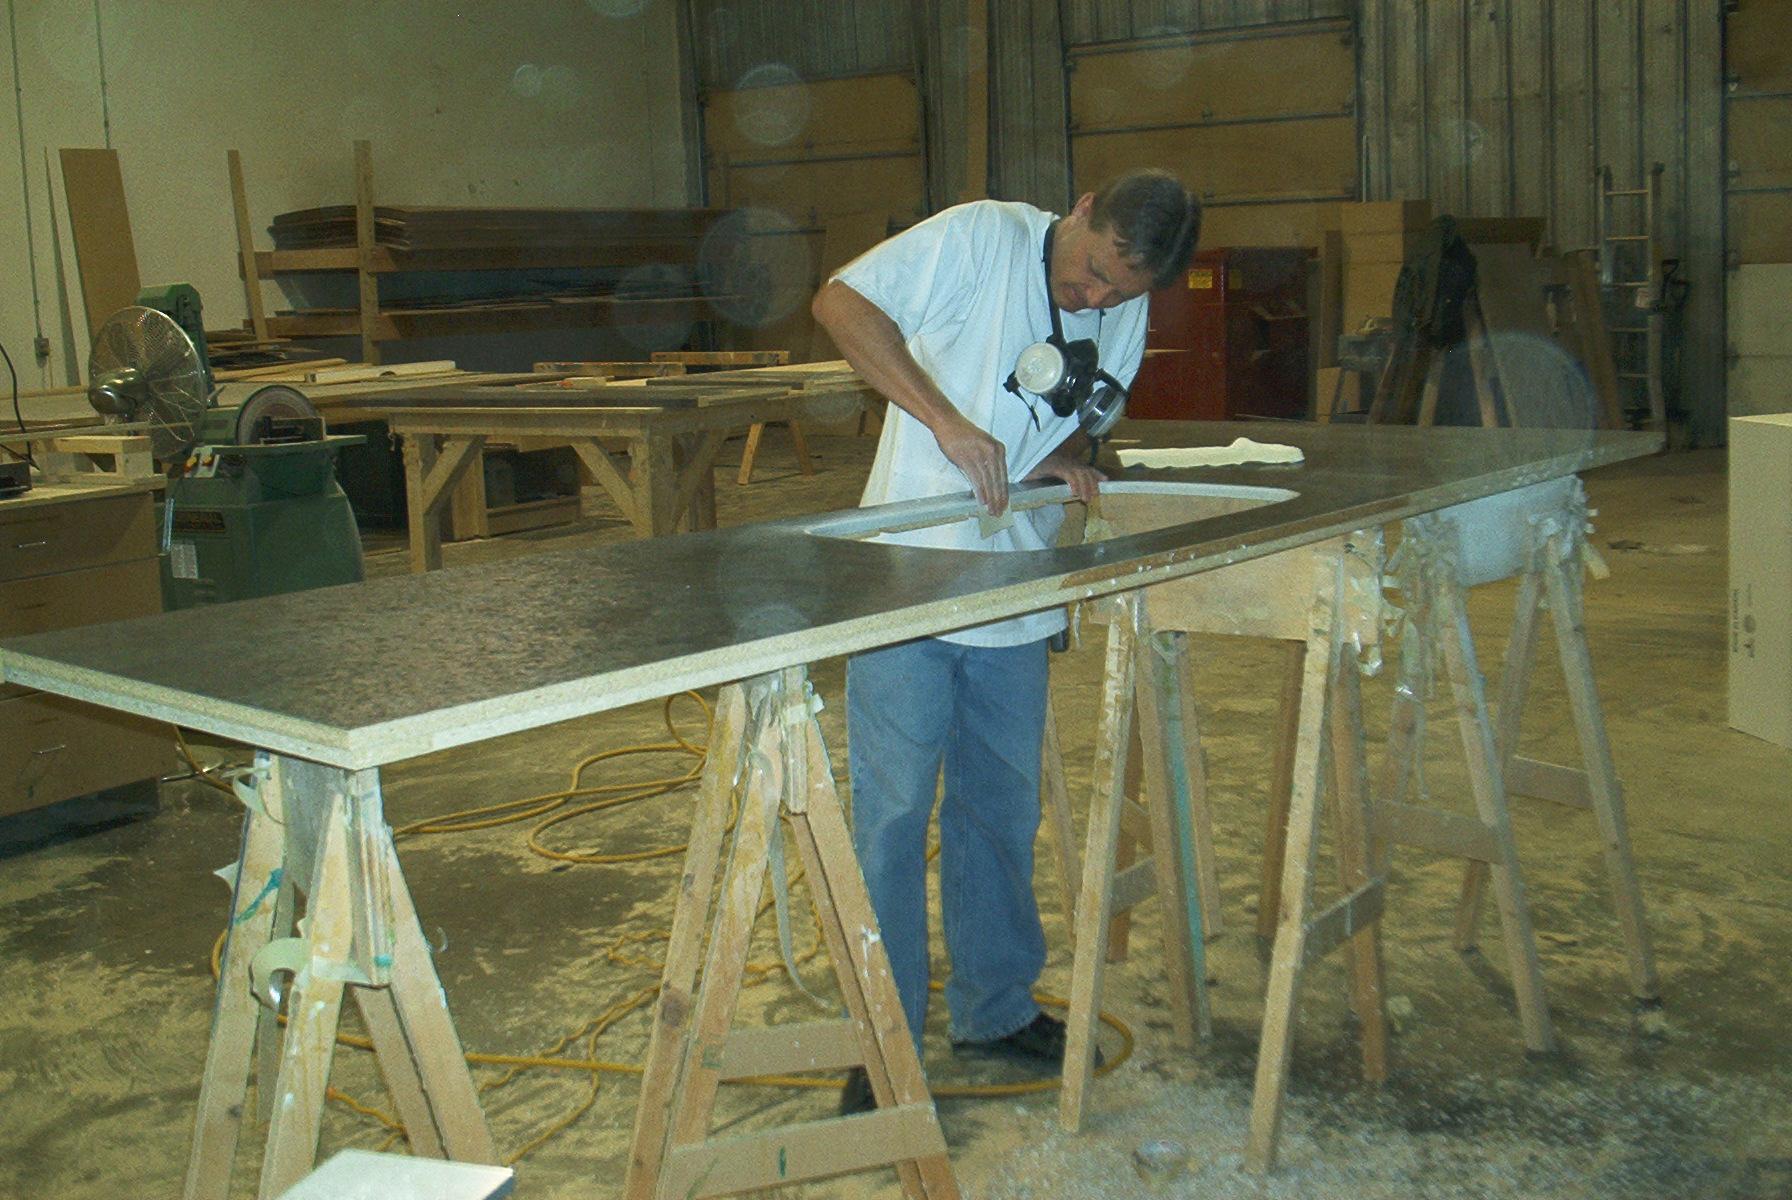 Laminate Countertops Company : ... Regina, Saskatchewan granite, quartz, laminate countertop company